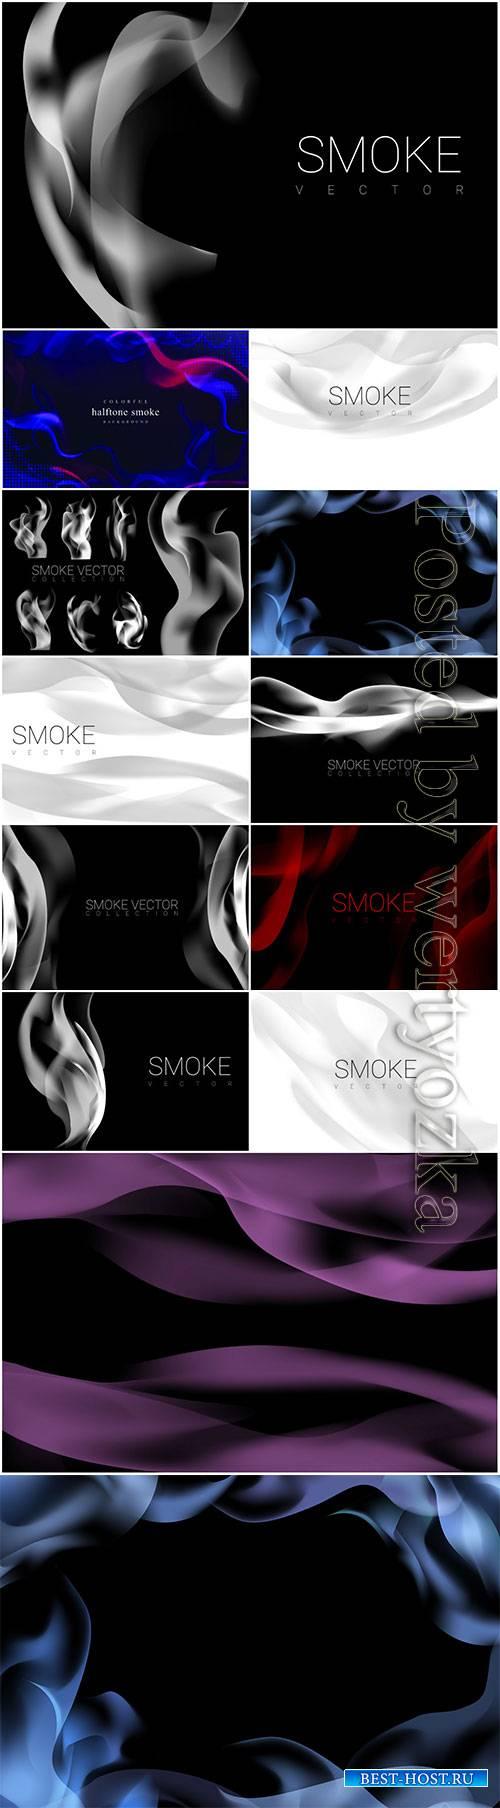 Set of smoke vector background